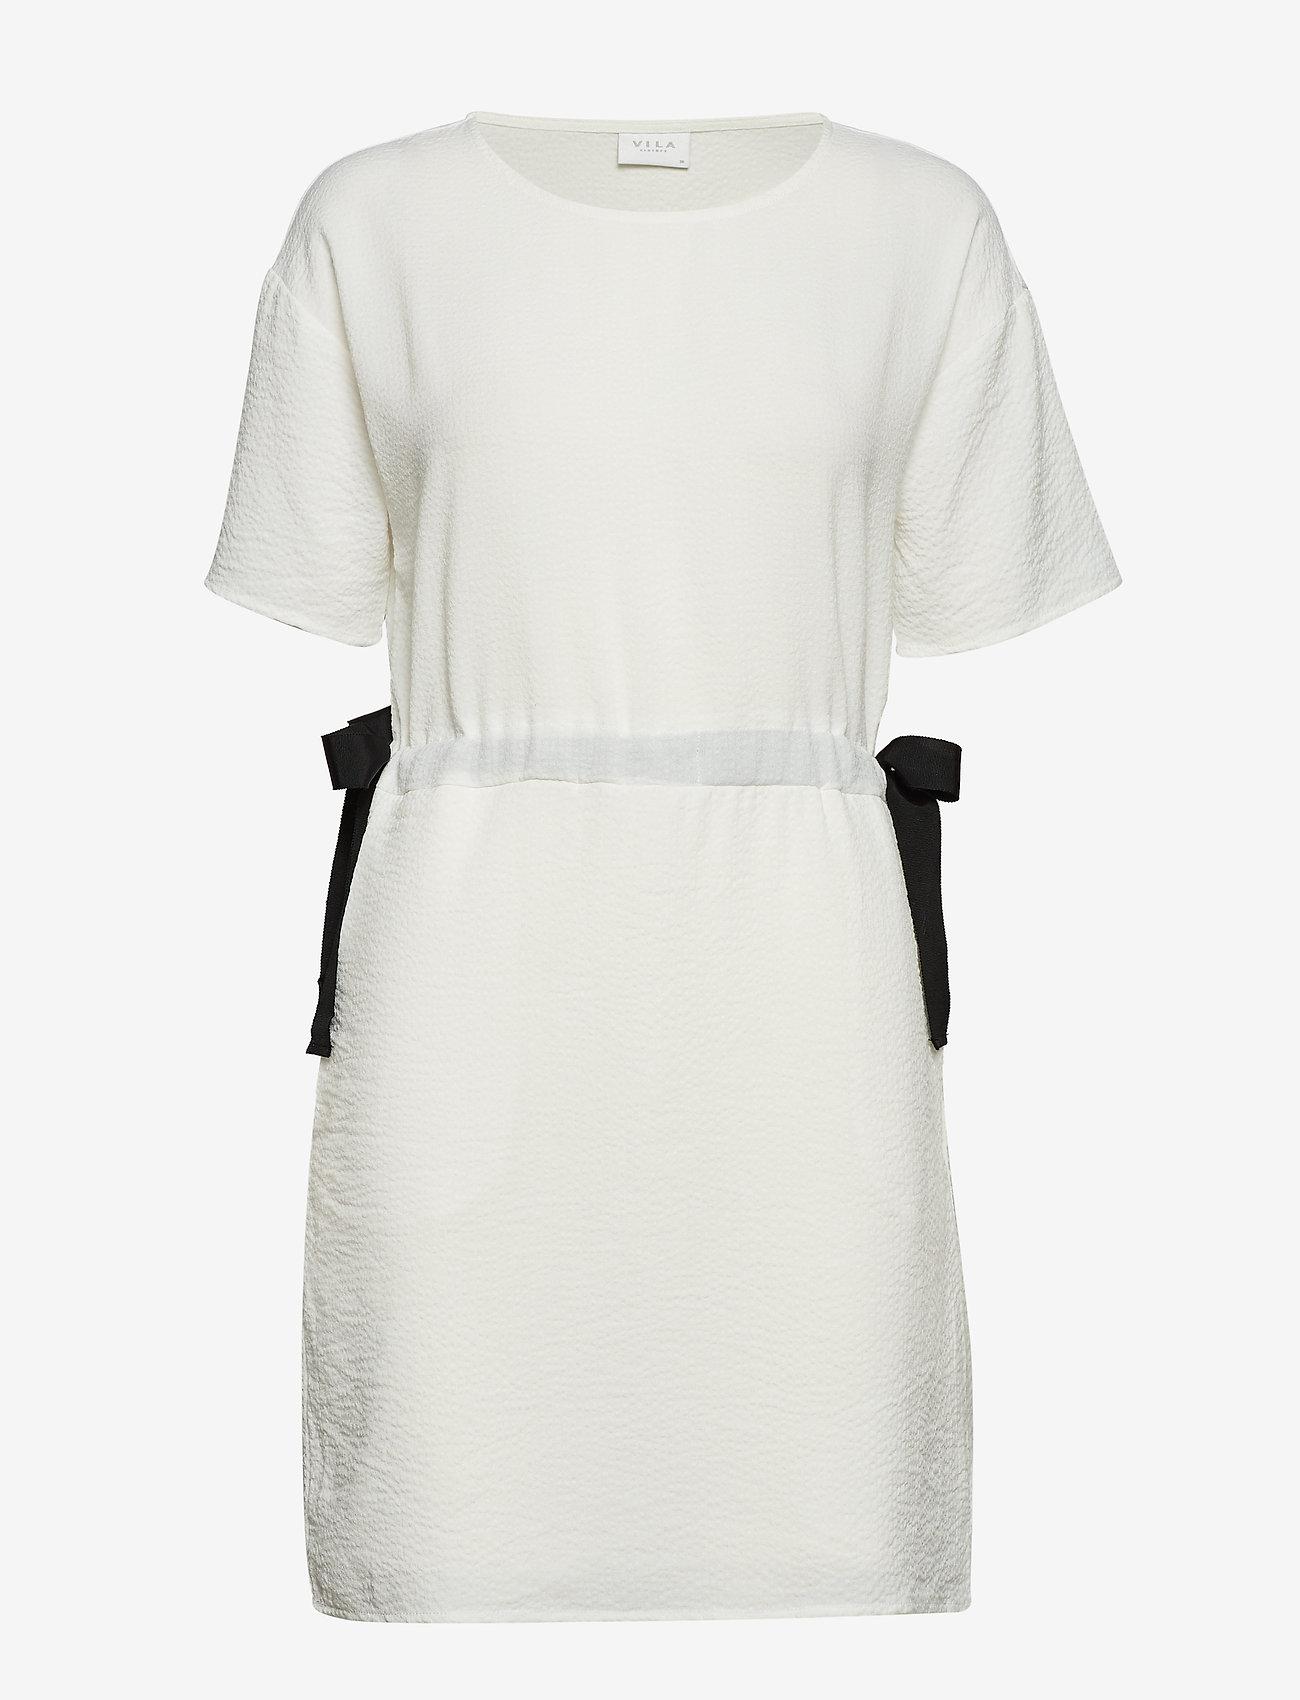 Vila - VILAMIDA 2/4 DRESS - short dresses - snow white - 0